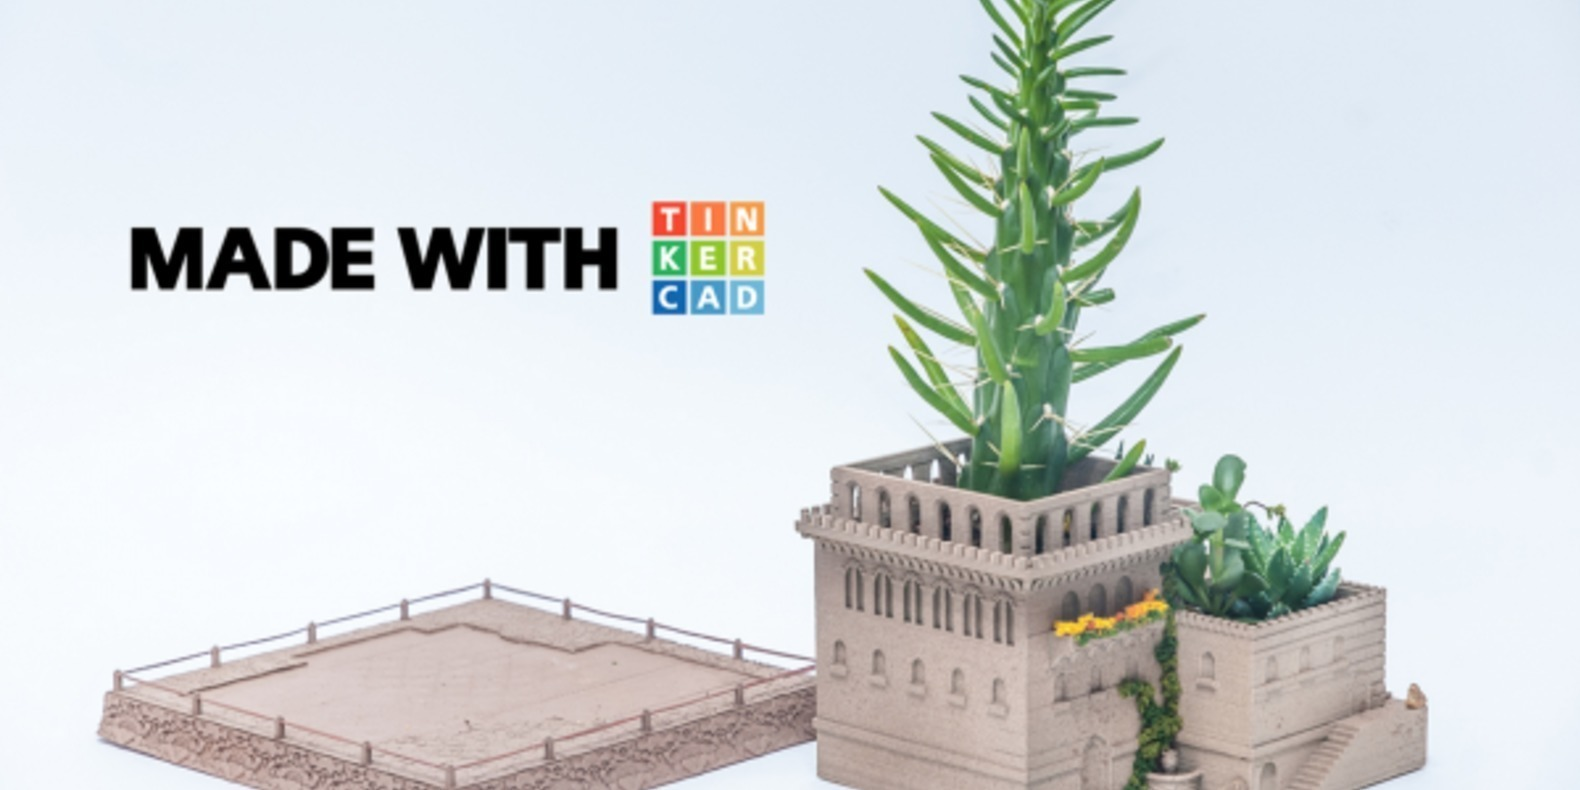 YURIYSKLYAR planter tinkercad makerbot fichier 3D cults 4